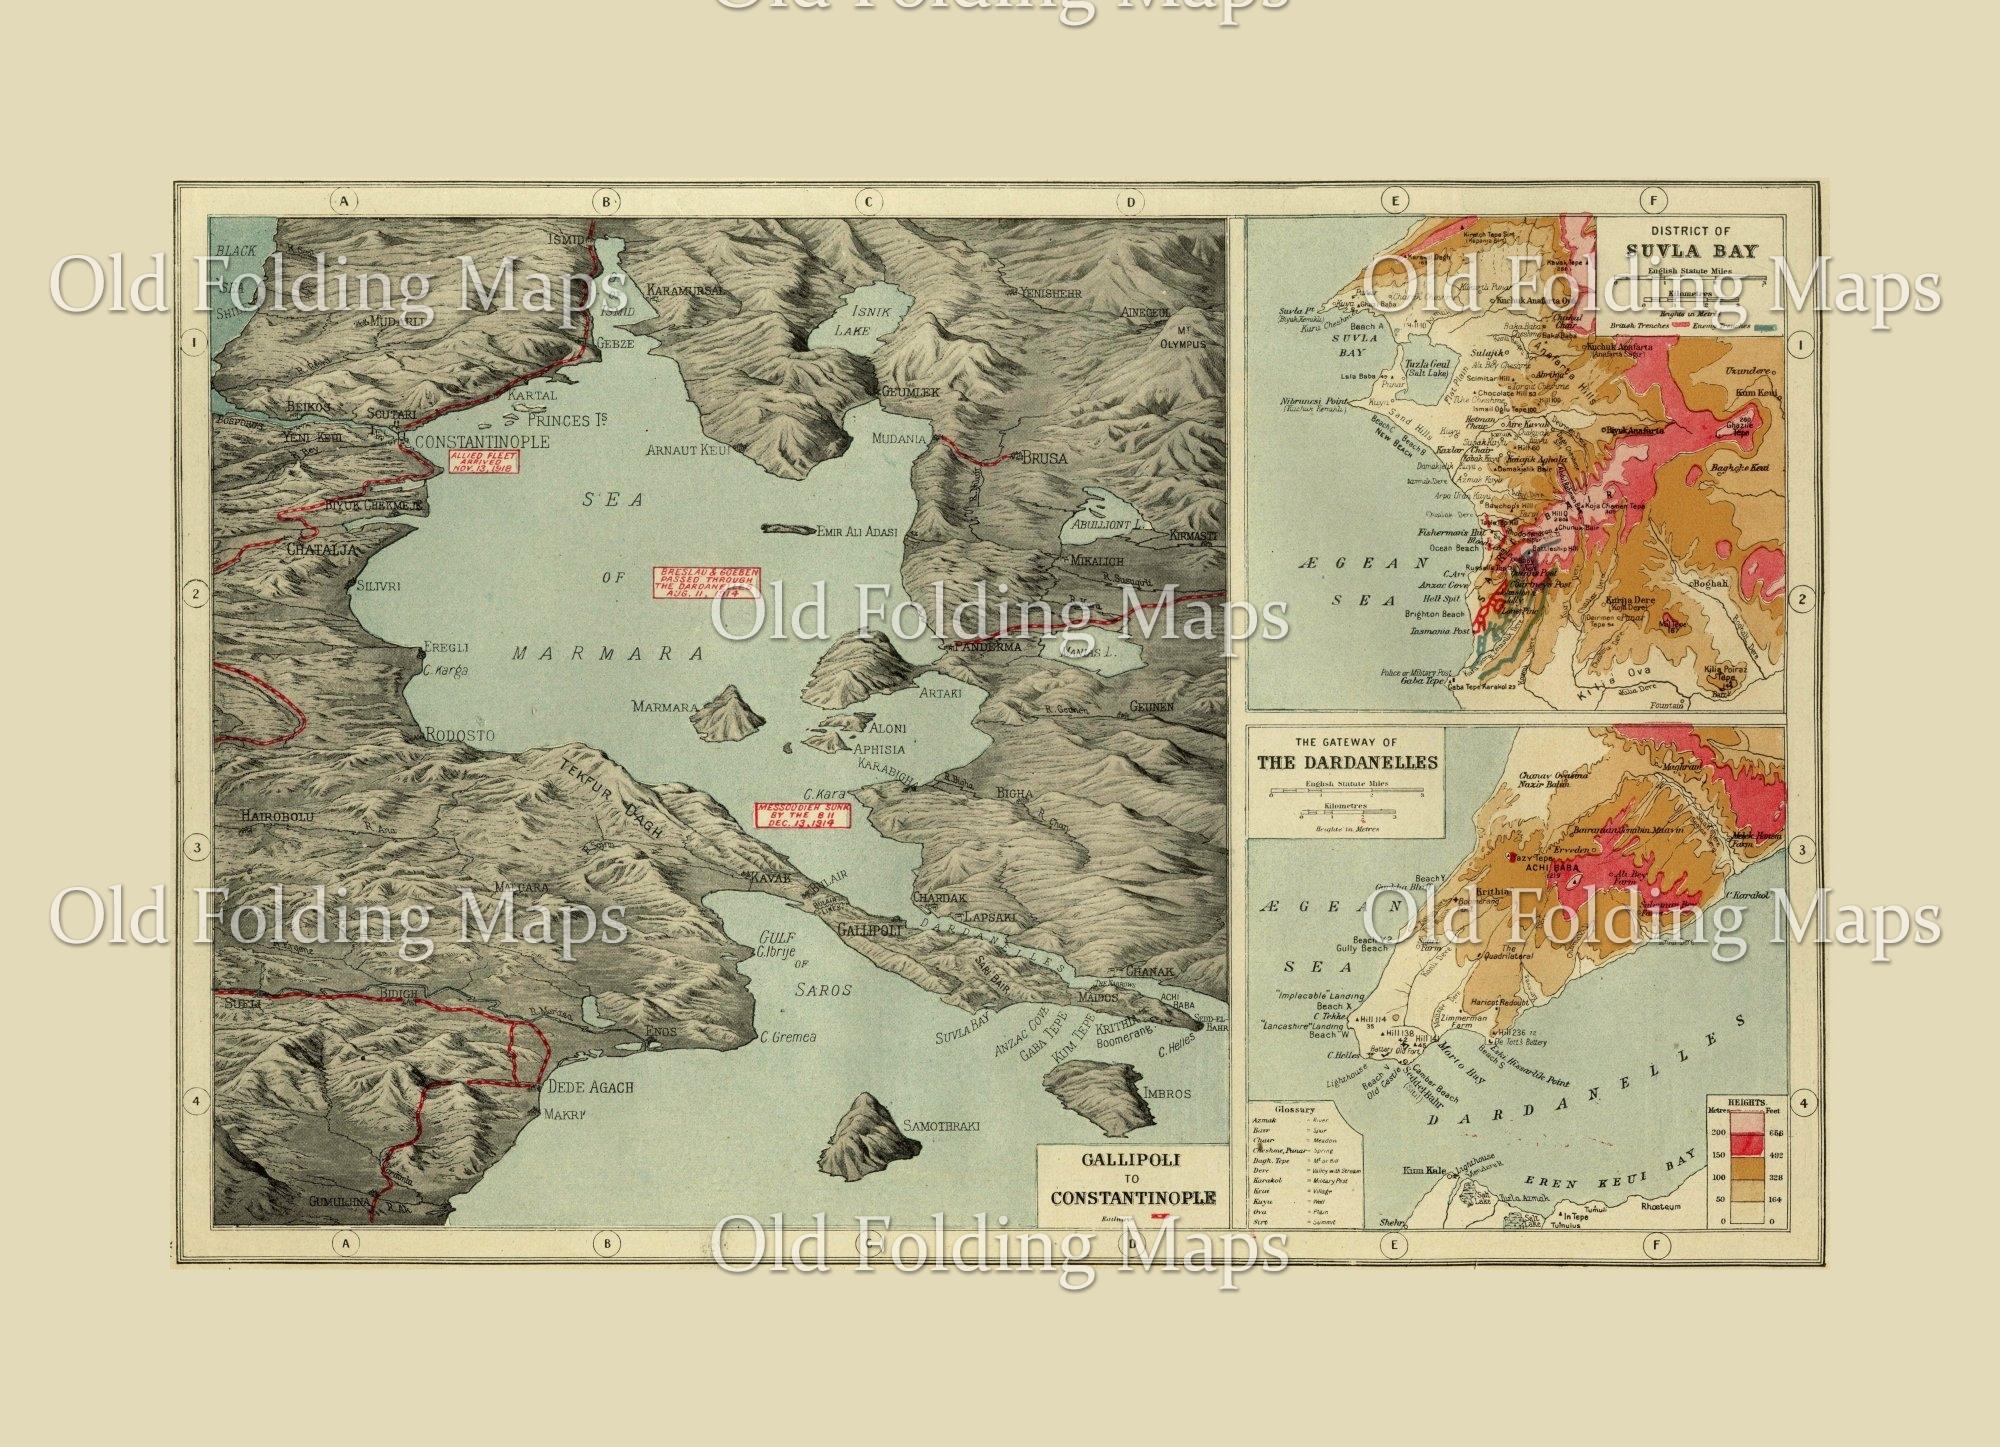 World War One map of Gallipoli & the Dardanelles, Turkey - 1914 on